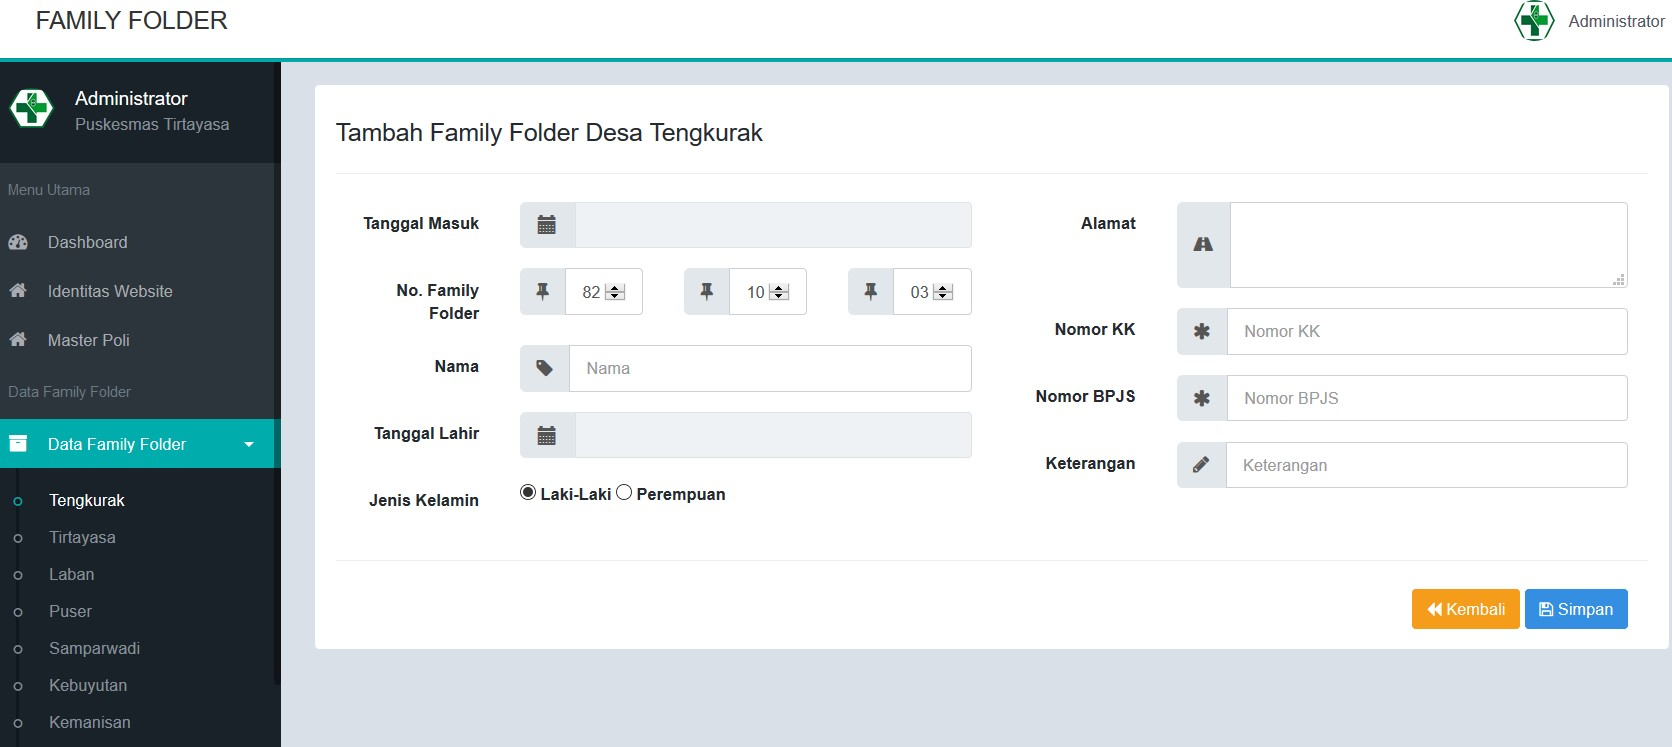 Aplikasi Rekam Medis Family Folder Tambah Data Pasien